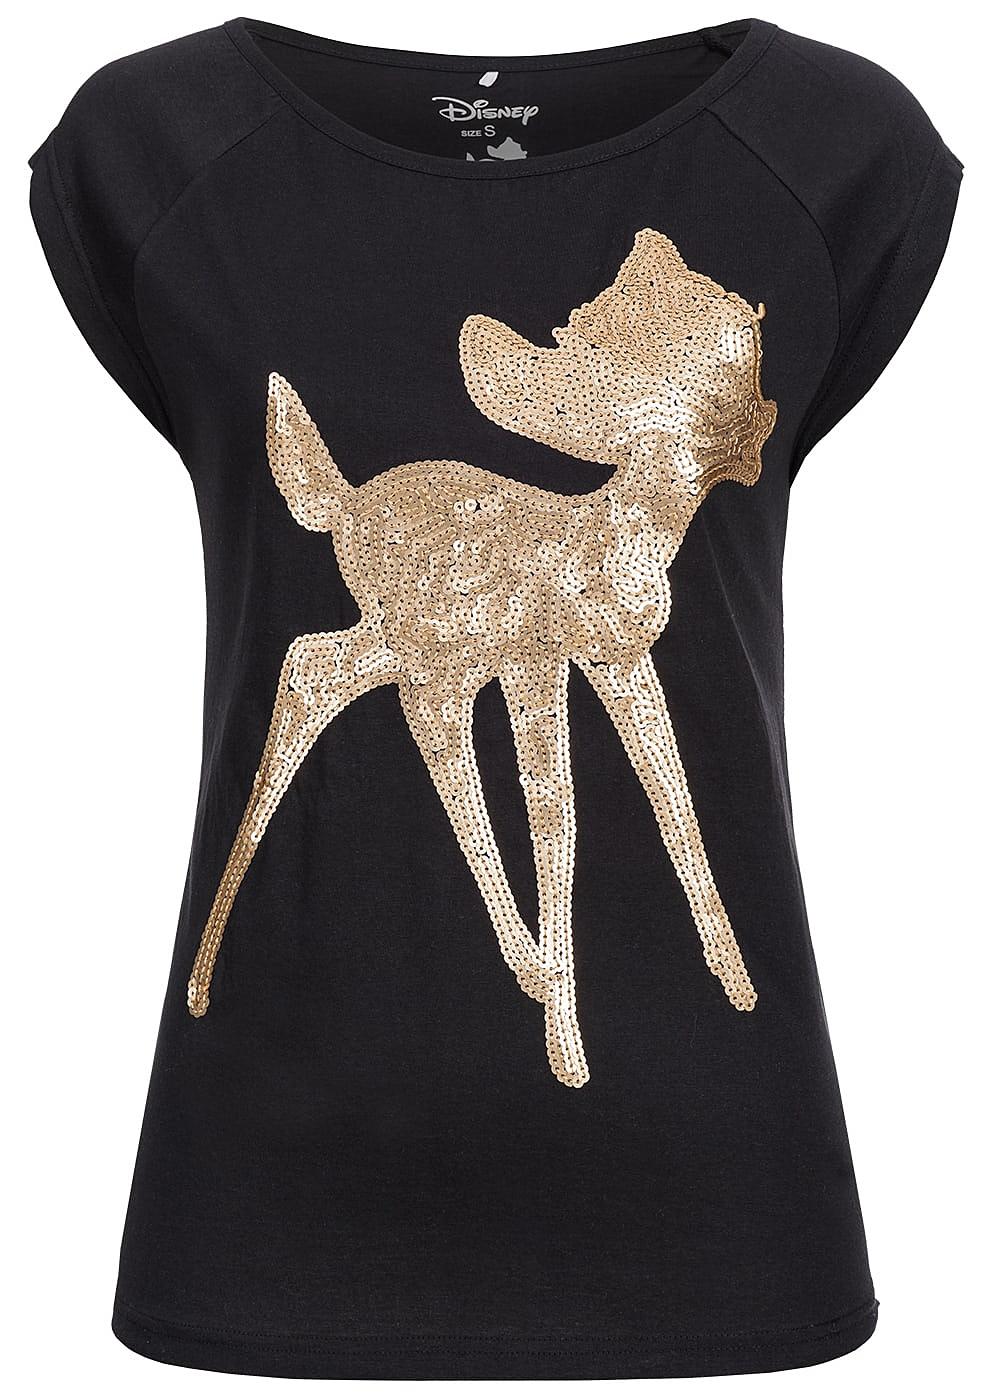 hailys damen t shirt bambi pailletten schwarz 77onlineshop. Black Bedroom Furniture Sets. Home Design Ideas